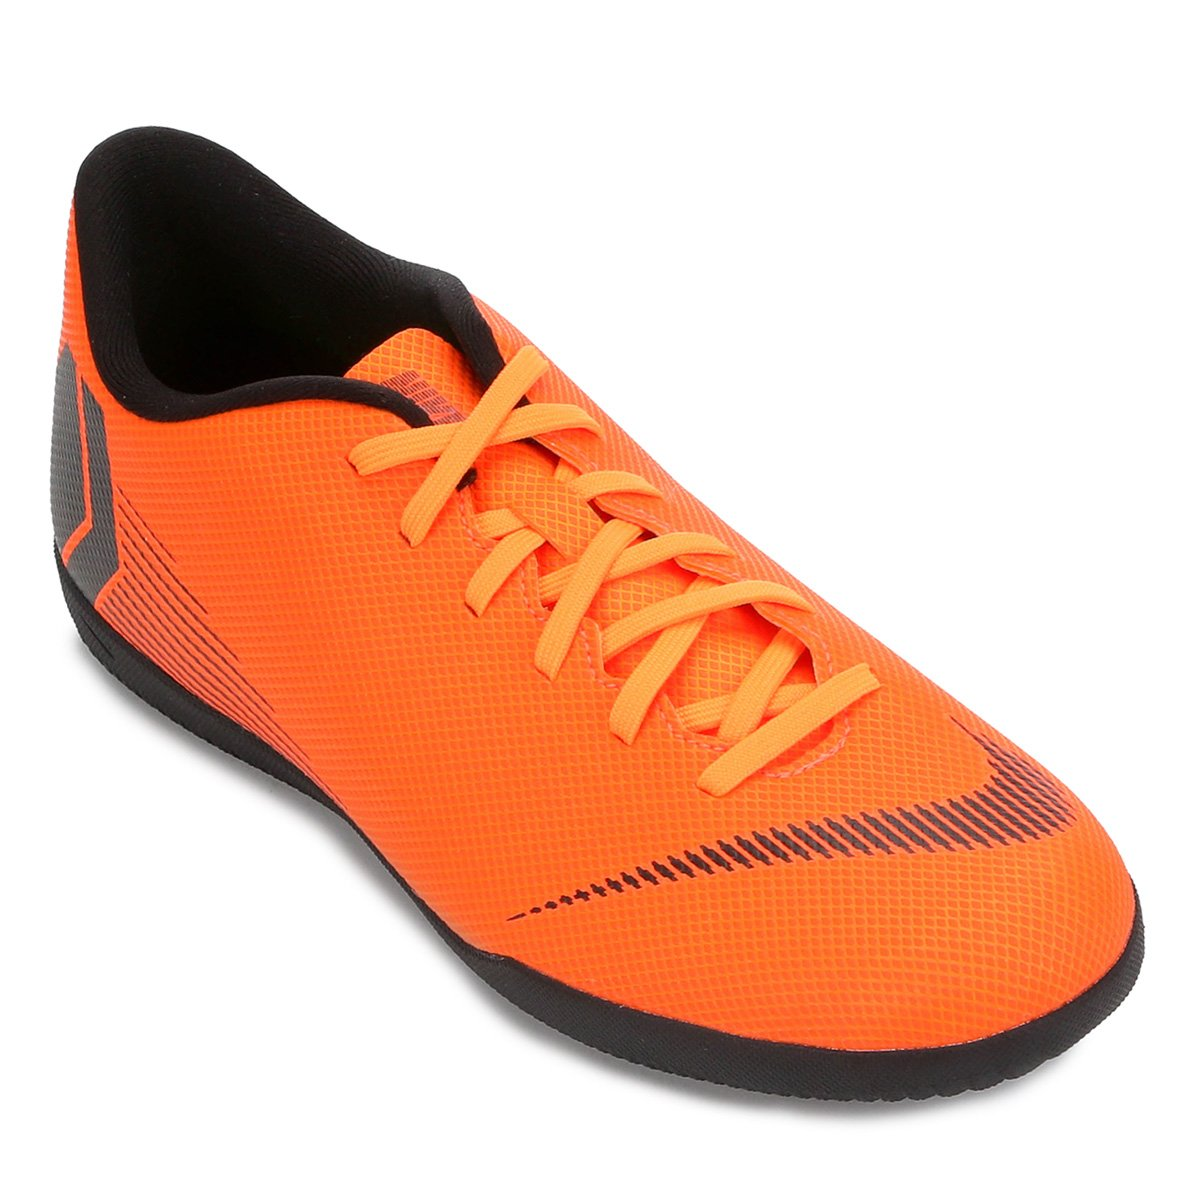 5a82e77967938 ... cheap chuteira futsal nike mercurial vapor 12 club masculina  laranjapreto 2a96e 5c2a5